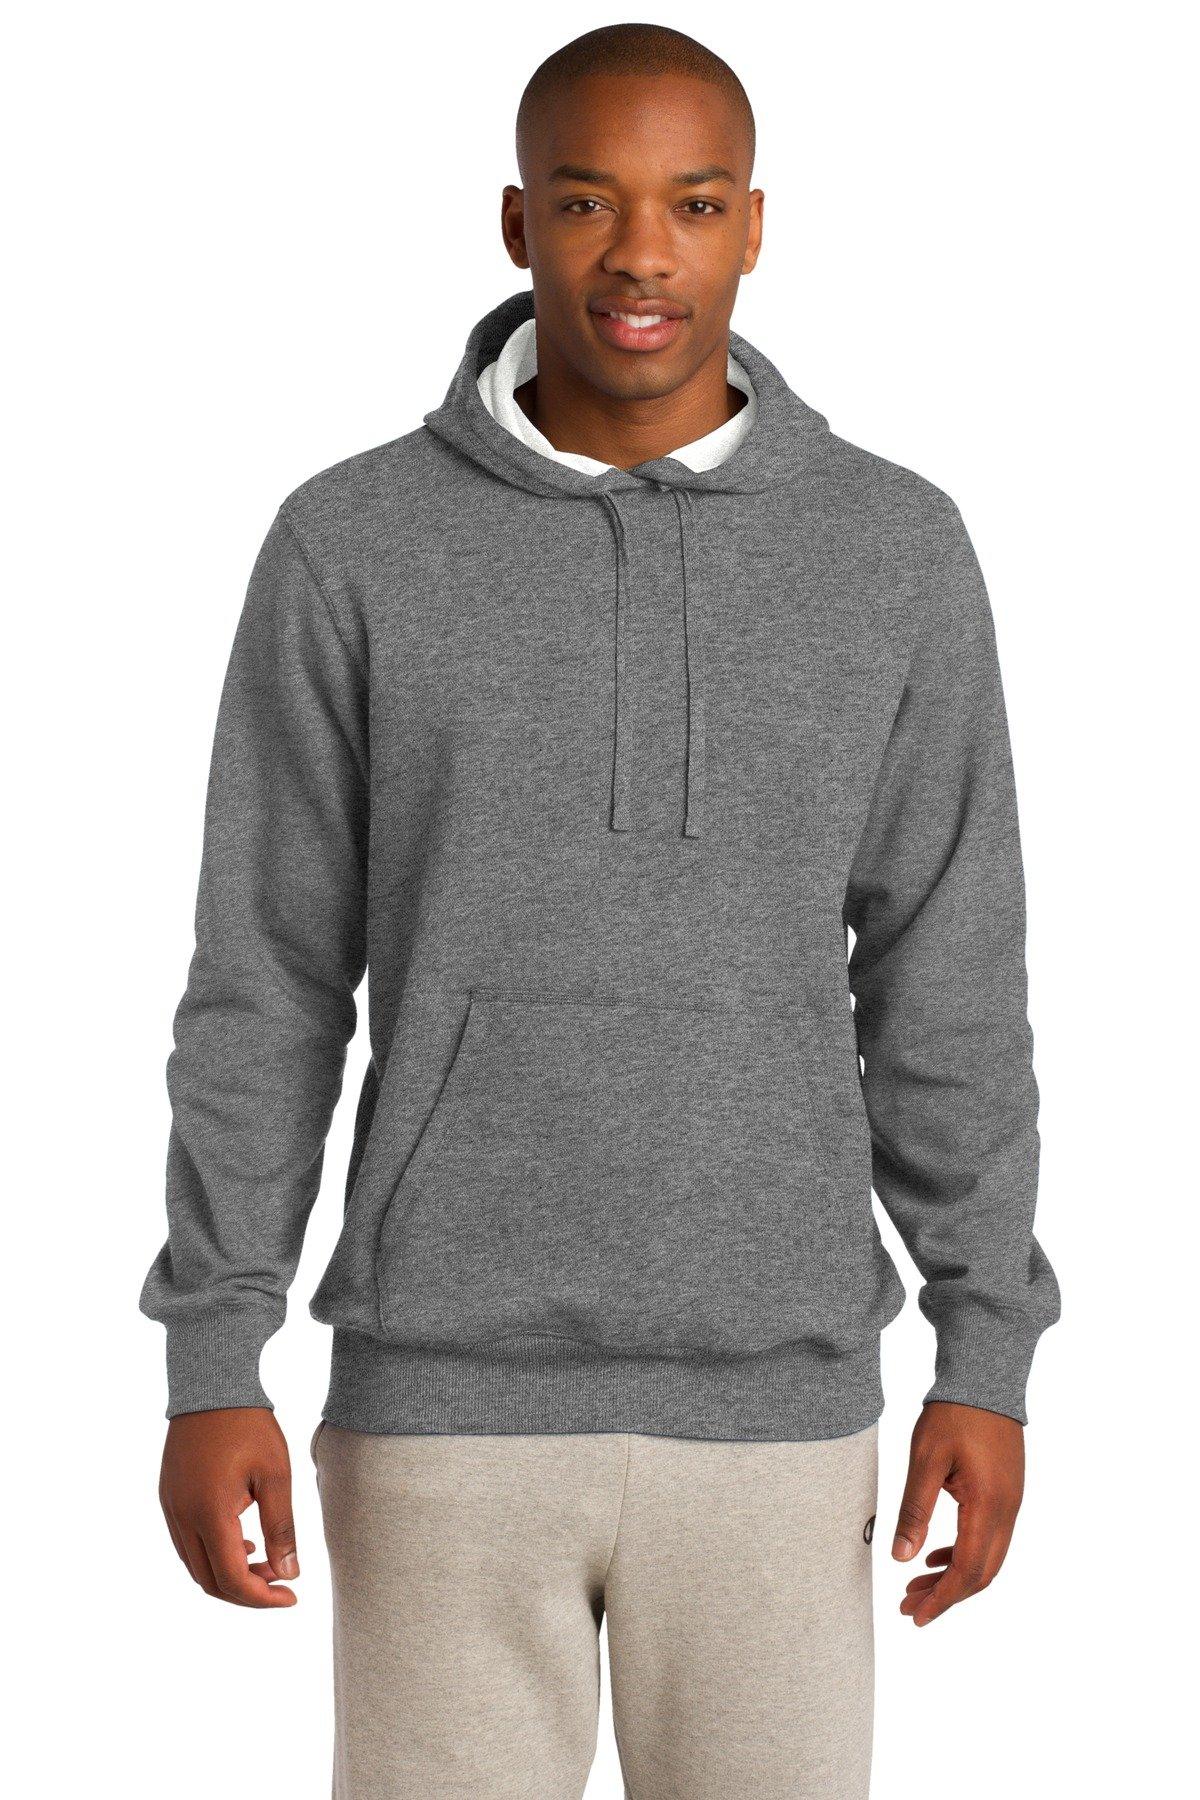 Sport-Tek Men's Pullover Hooded Sweatshirt XXL Vintage Heather by Sport-Tek